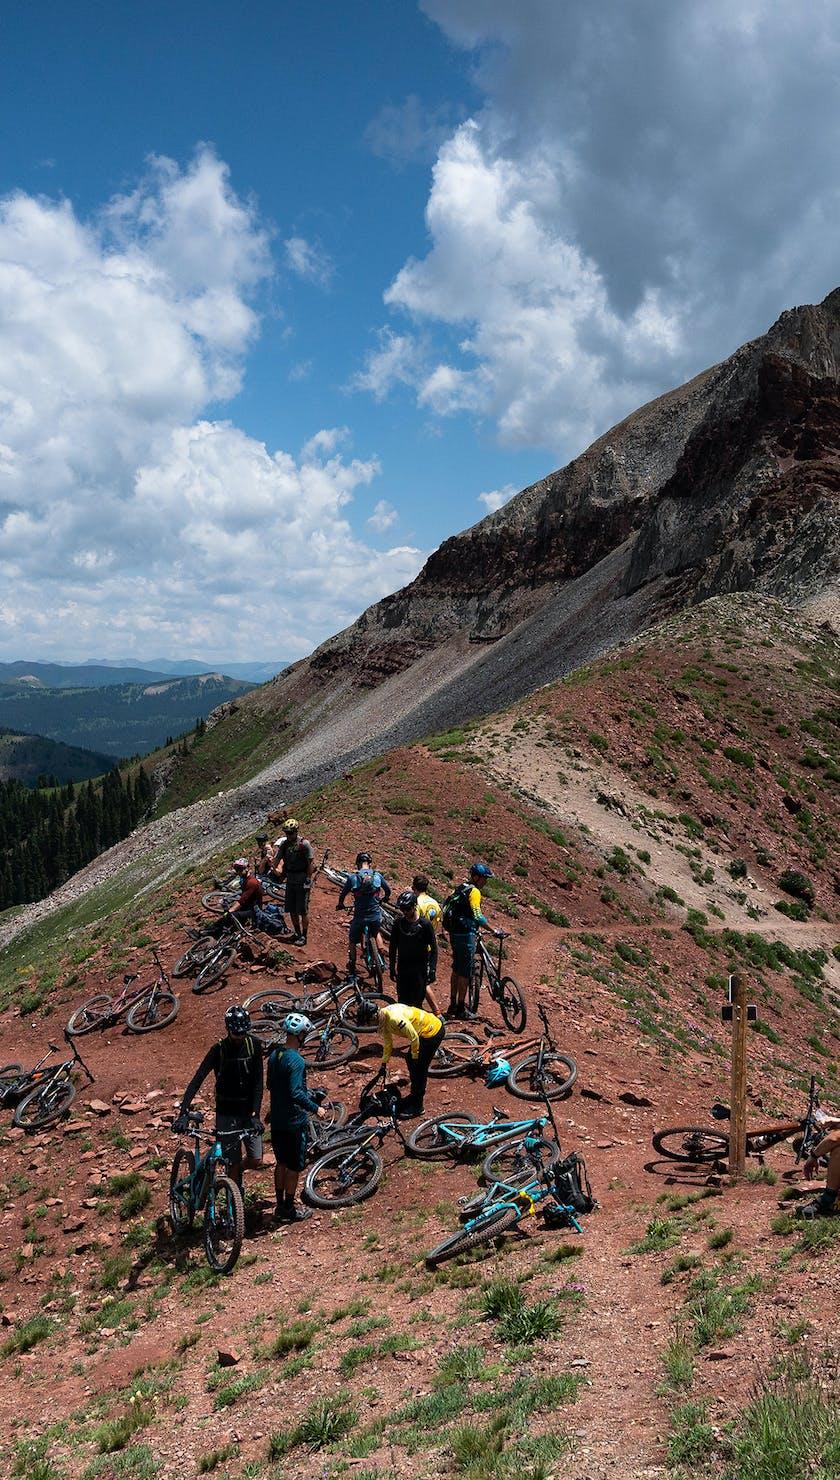 Durango Gathering 21 - The Summit